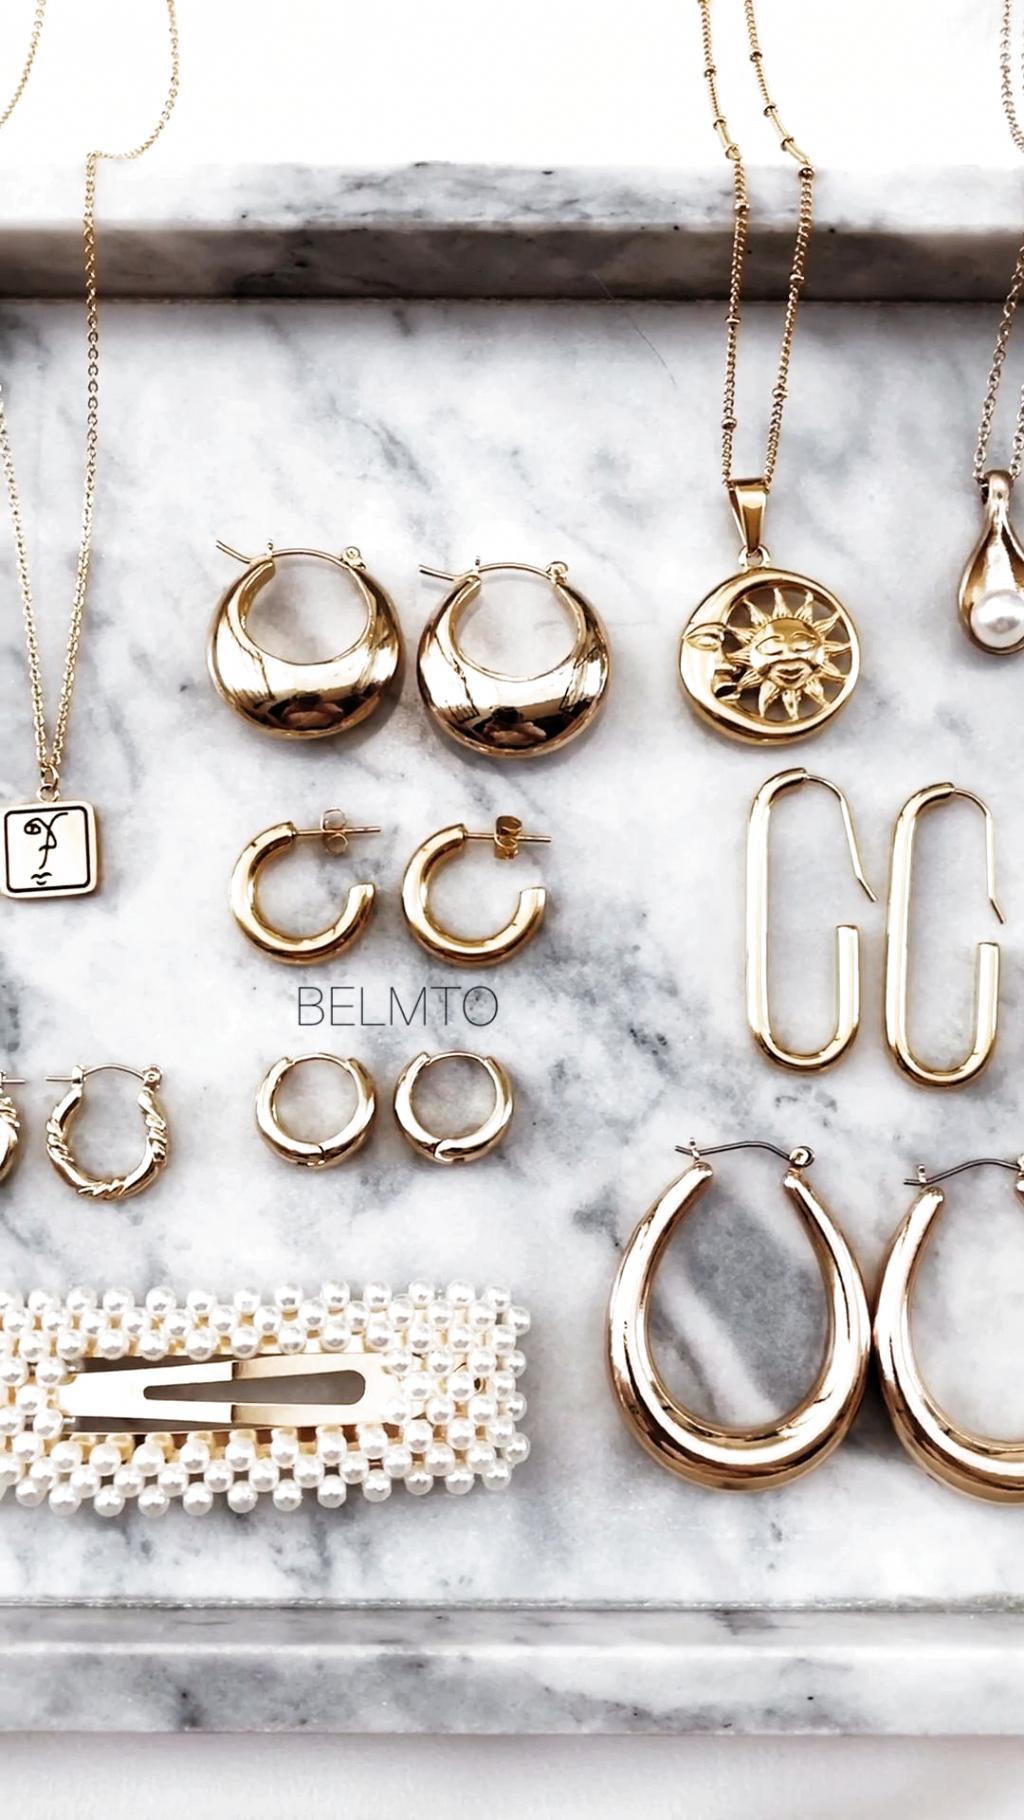 Pin by Weissundschwarz on Acessórios in 2020 | Cute jewelry